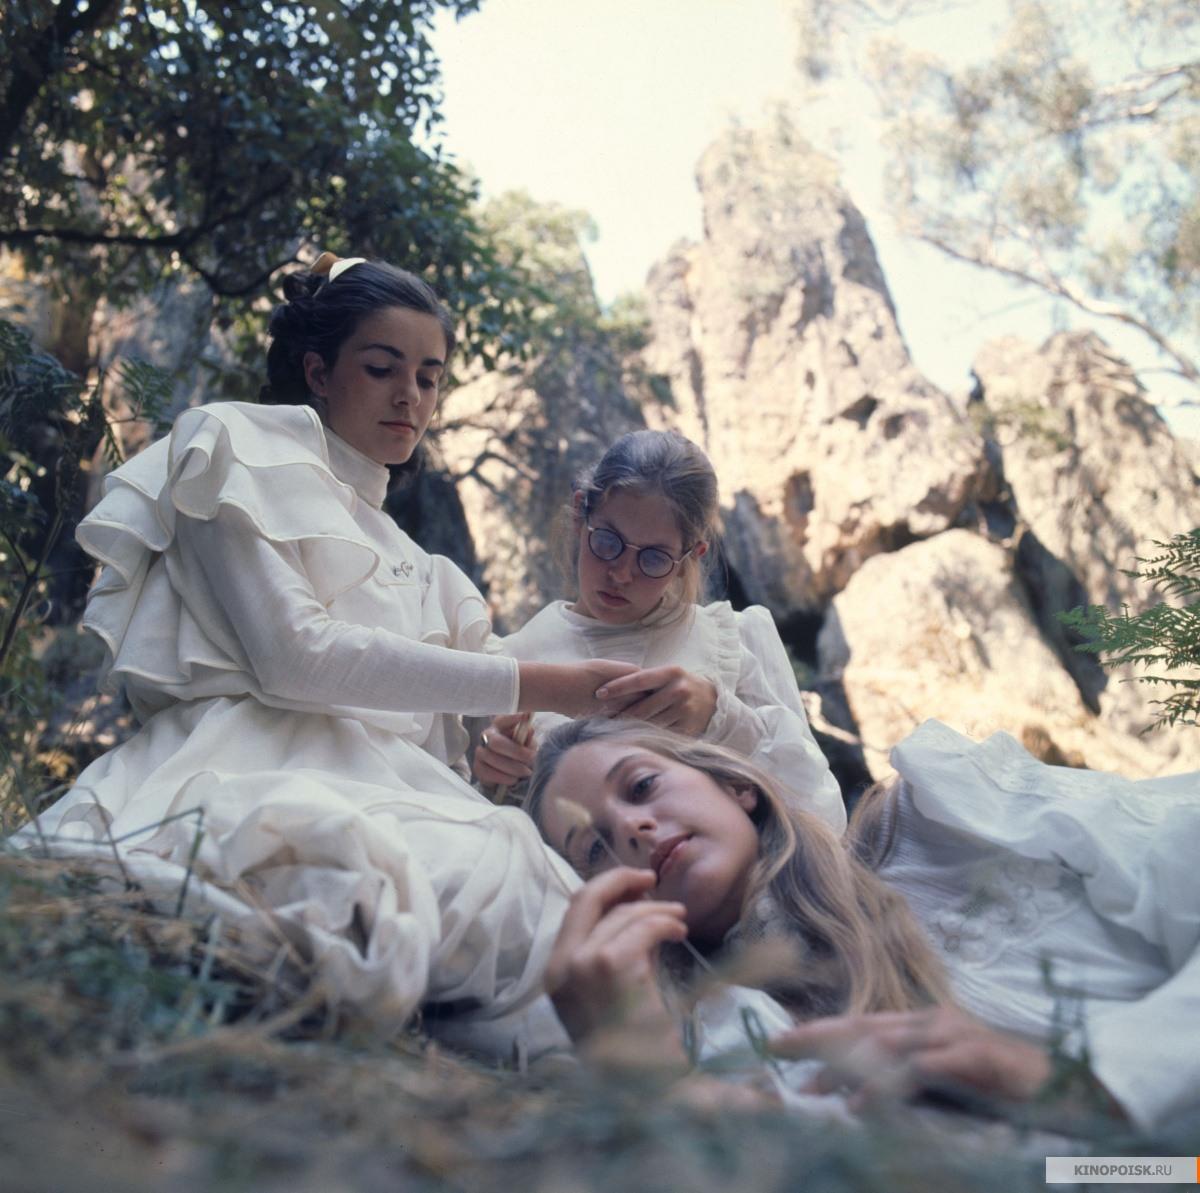 essay on picnic at hanging rock Buy picnic at hanging rock: read 56 movies & tv reviews - amazoncom.